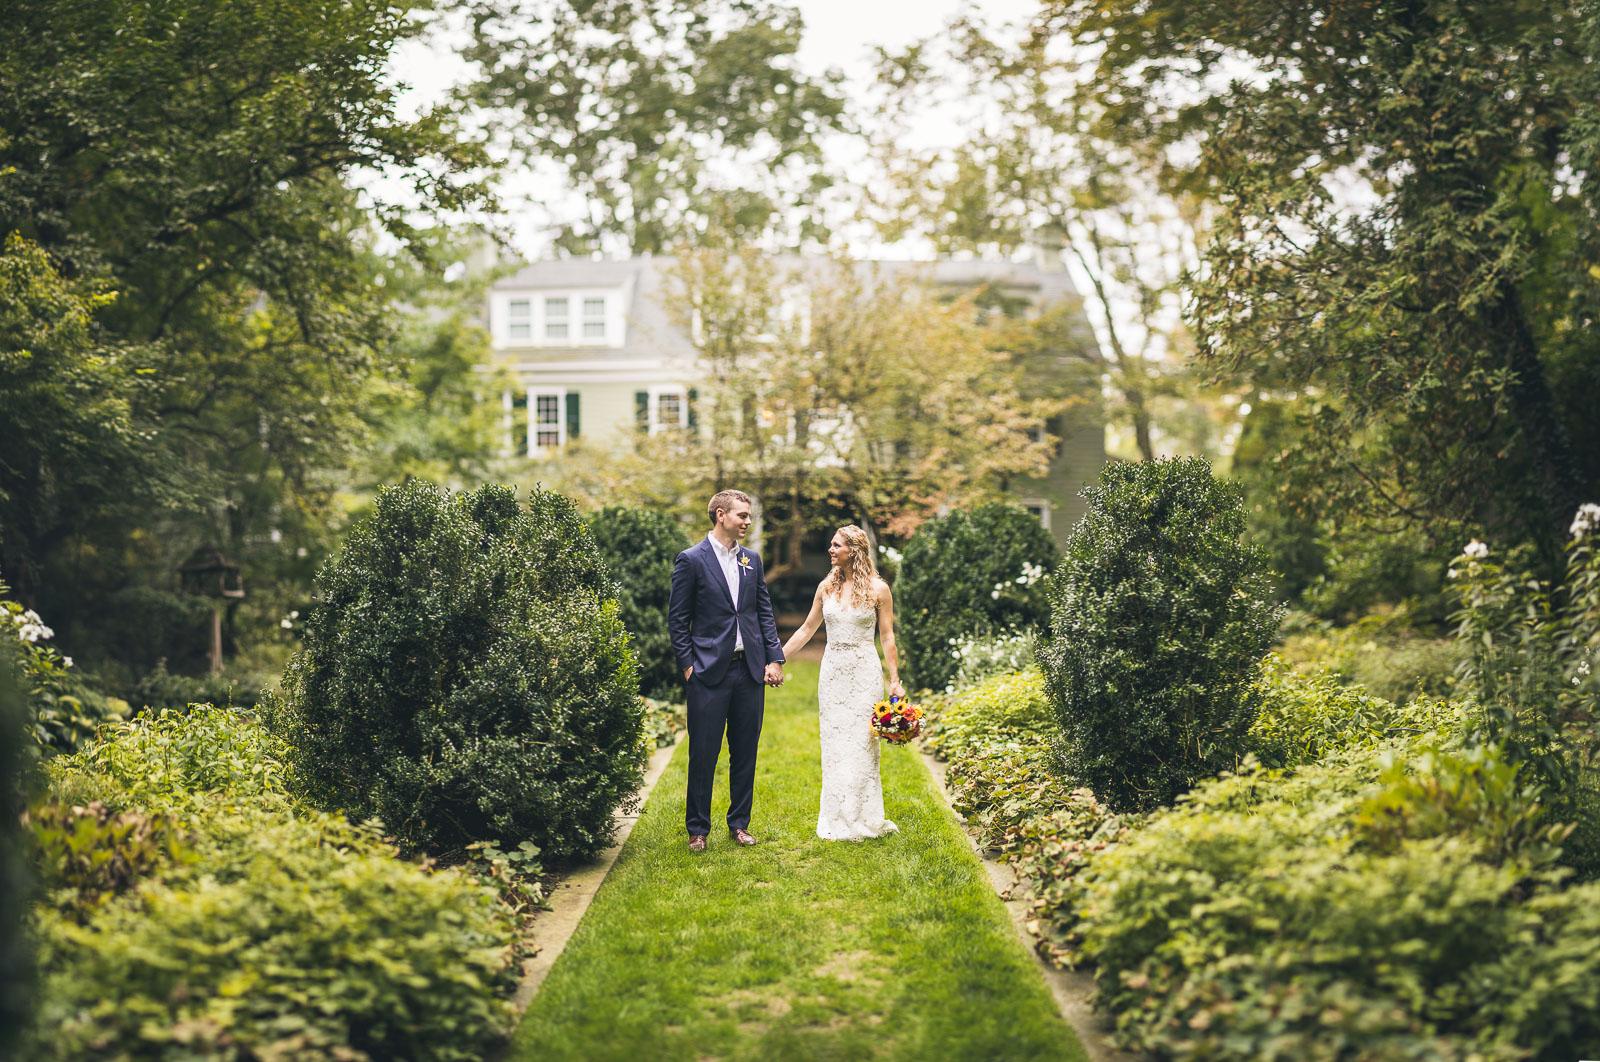 Willowwood Arboretum Creative Wedding Photography